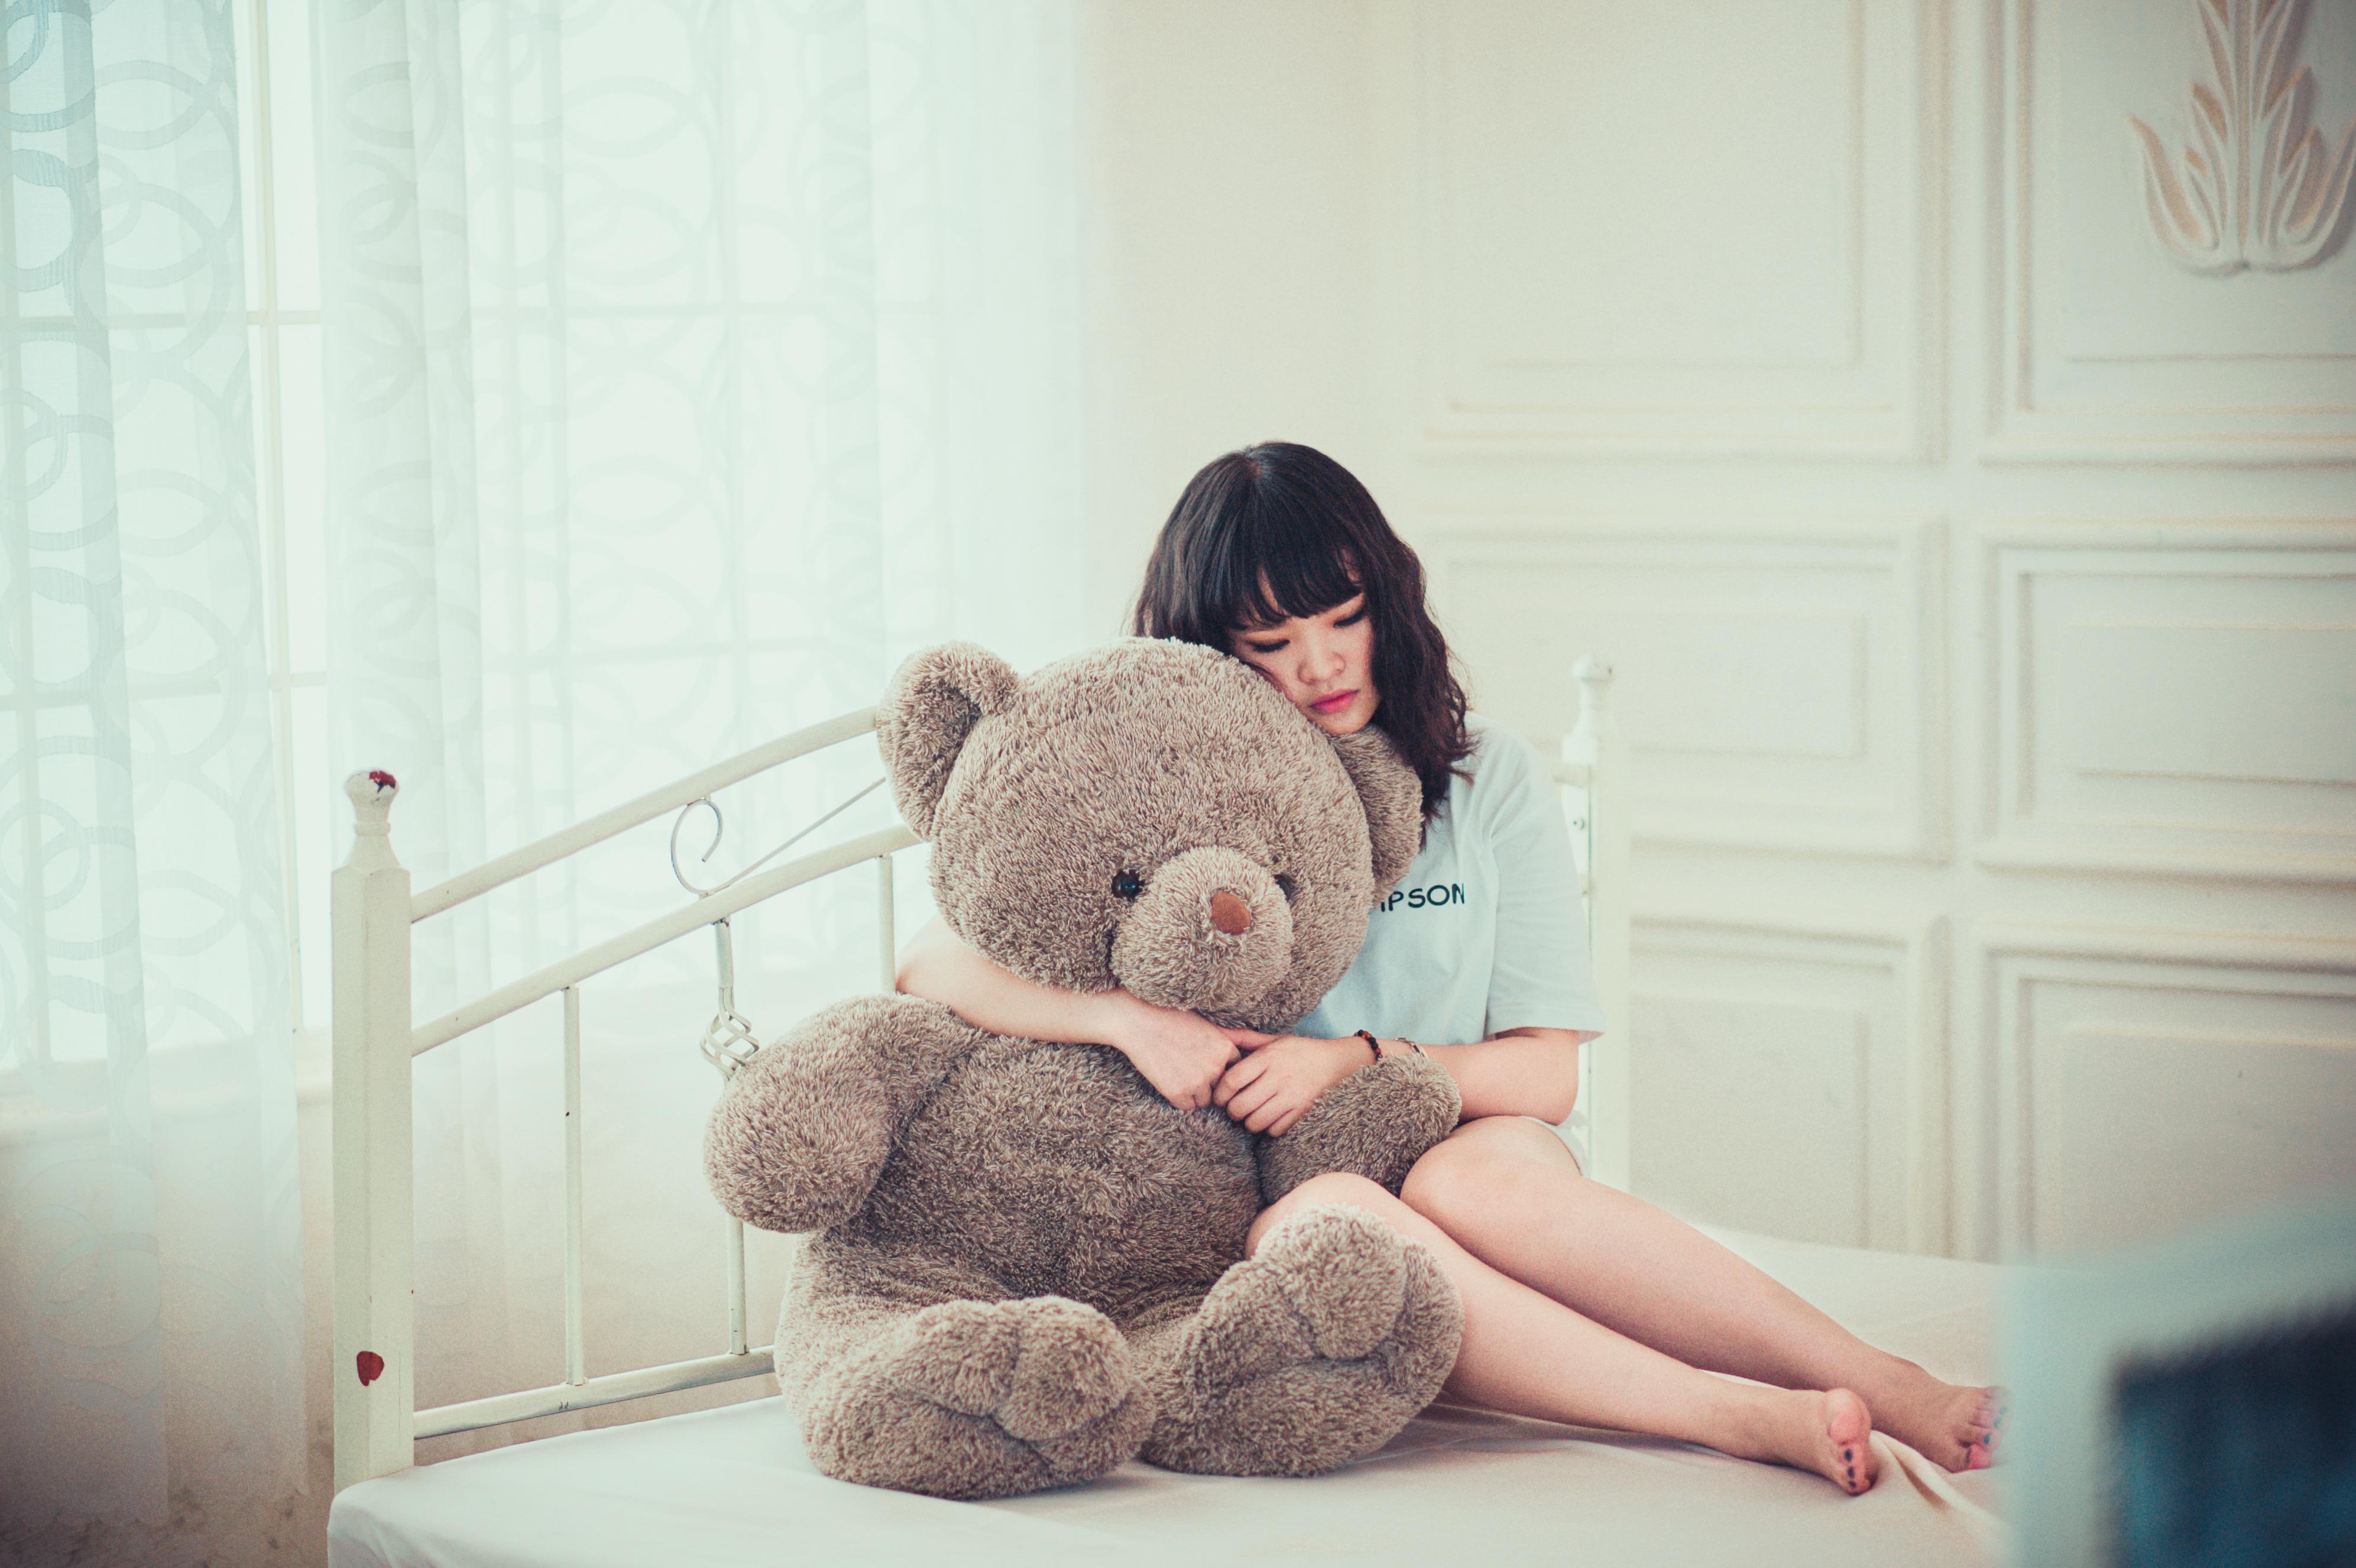 Jennifer Muller ostéopathe humeur et cycle menstruel